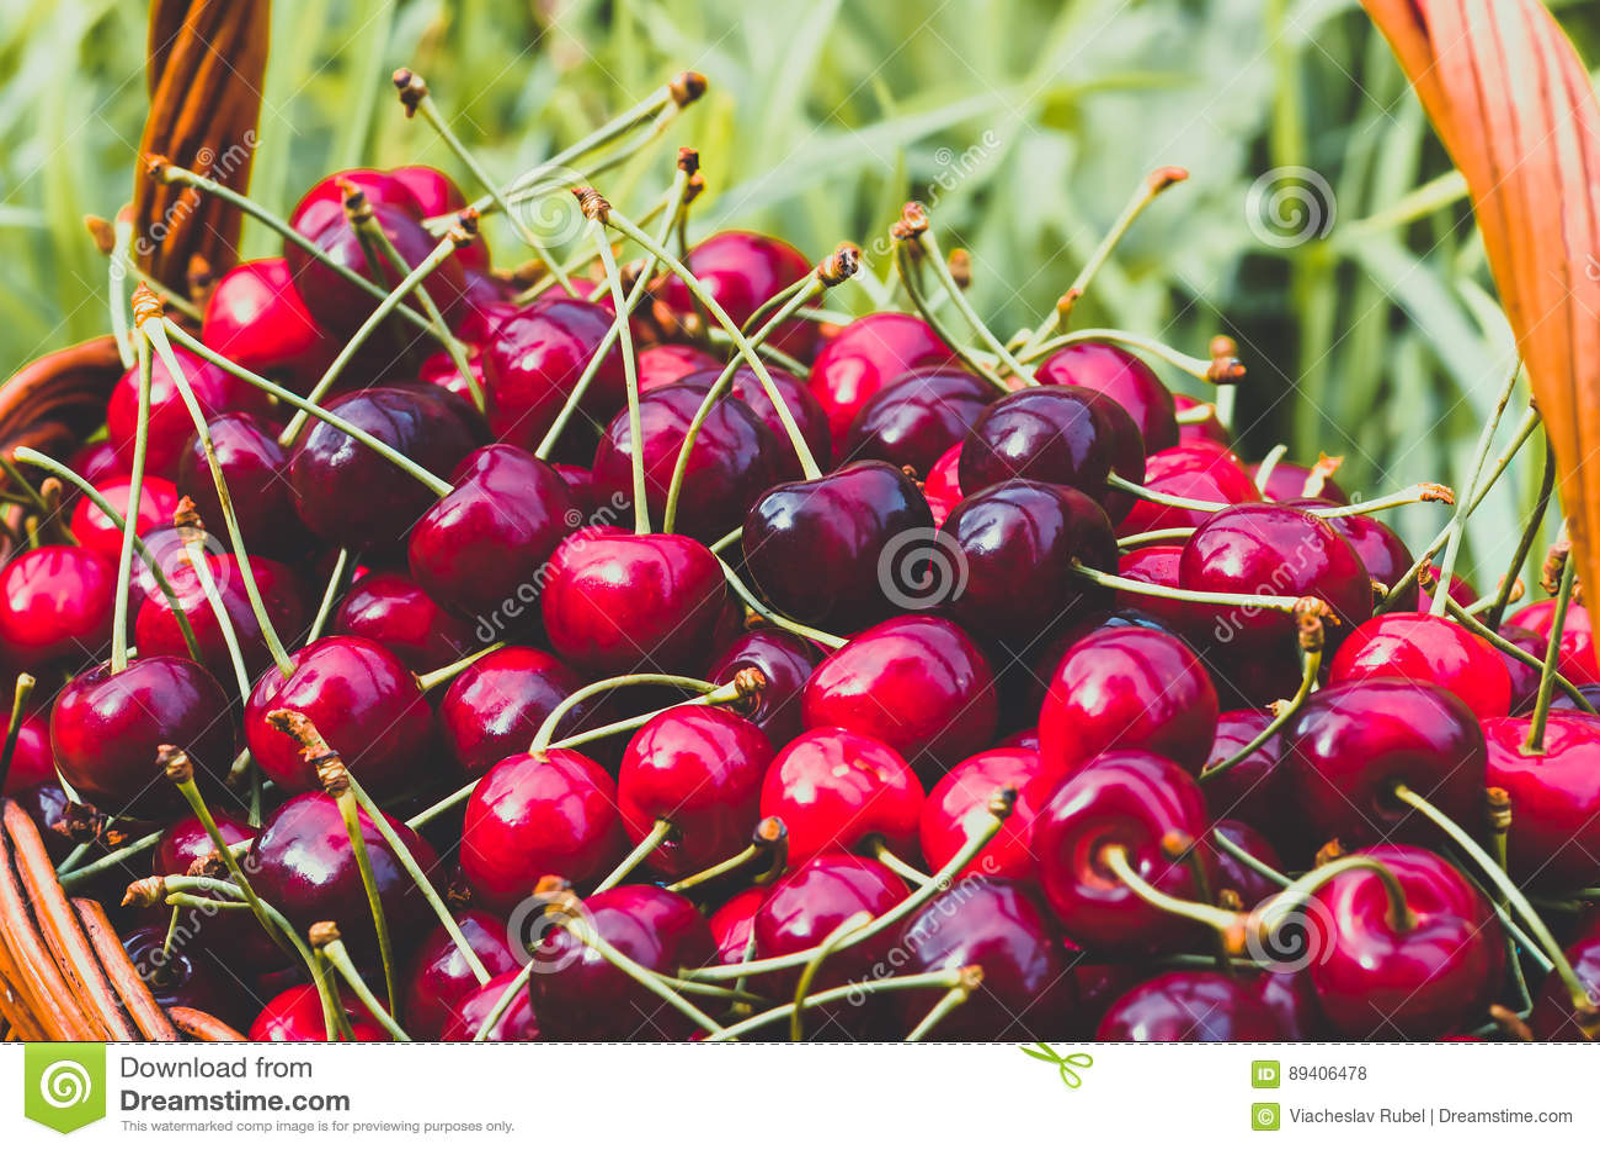 Cereja doce orgânica vermelha madura no jardim